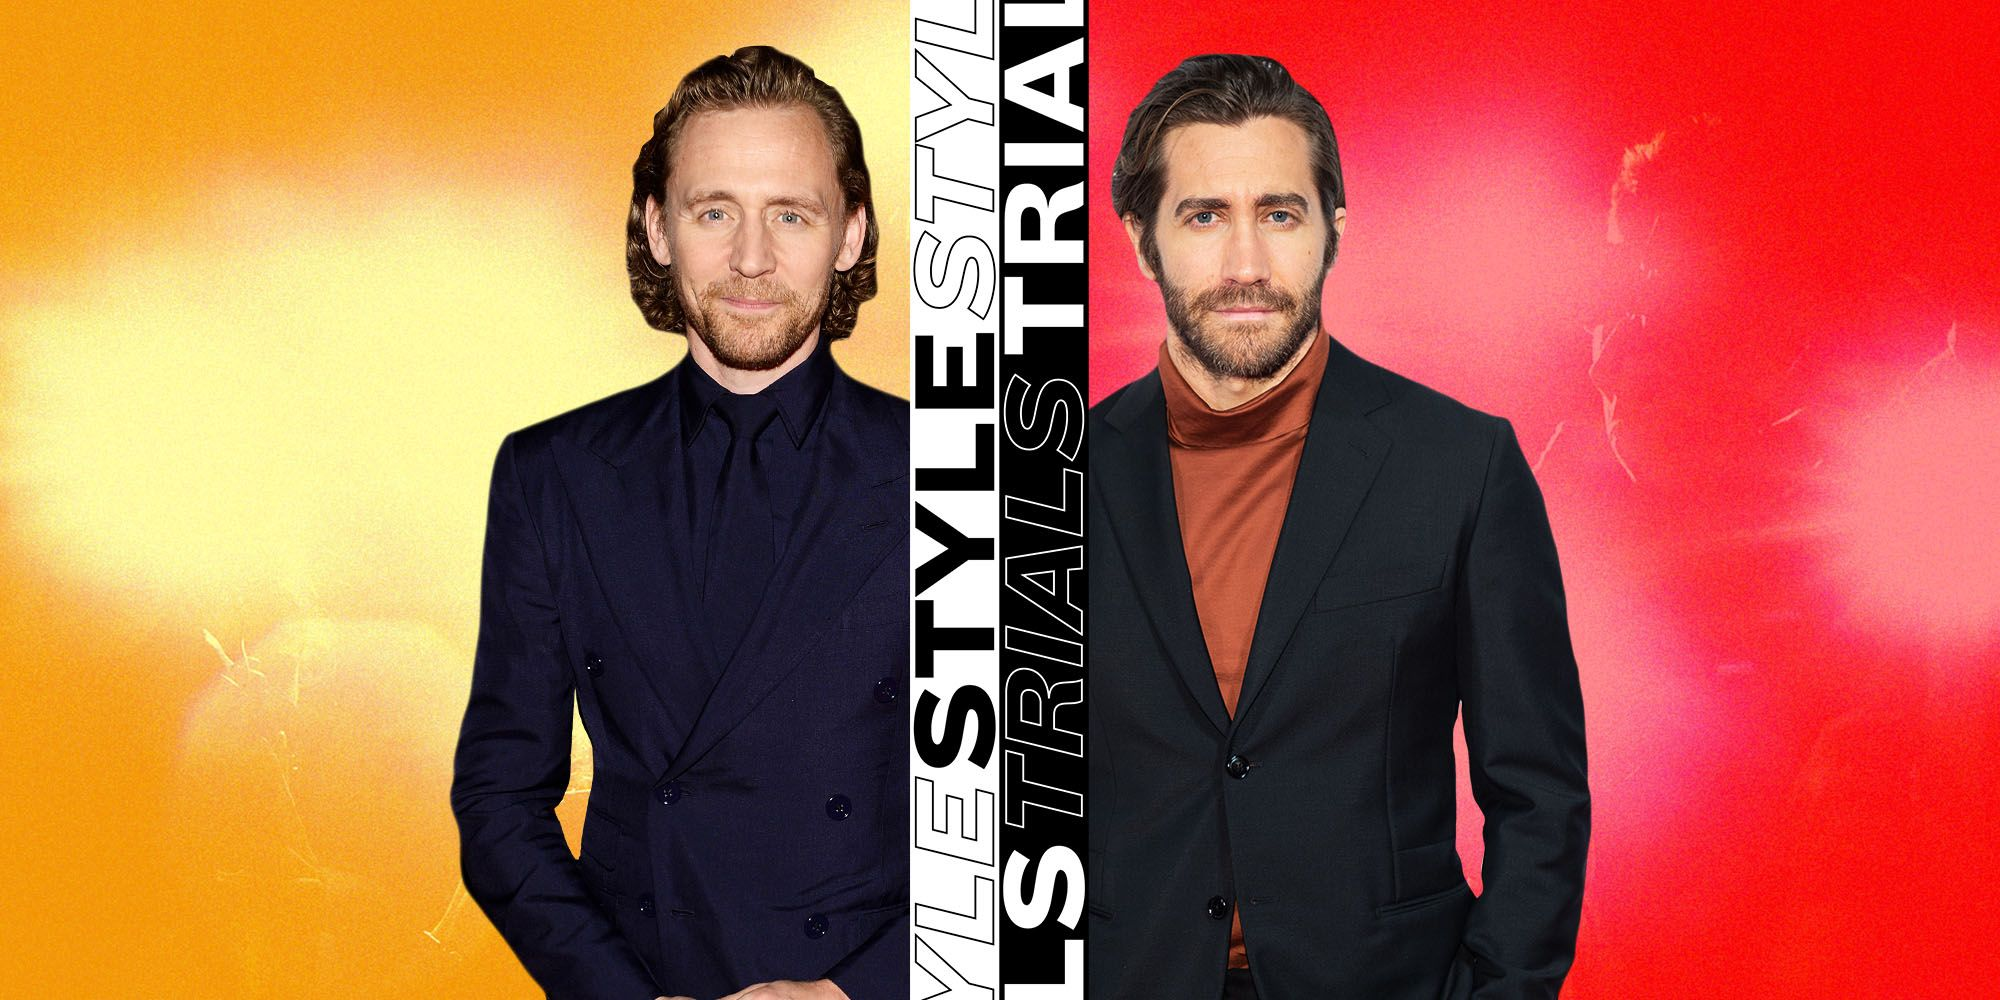 Style Trials 2019: Tom Hiddleston vs. Jake Gyllenhaal